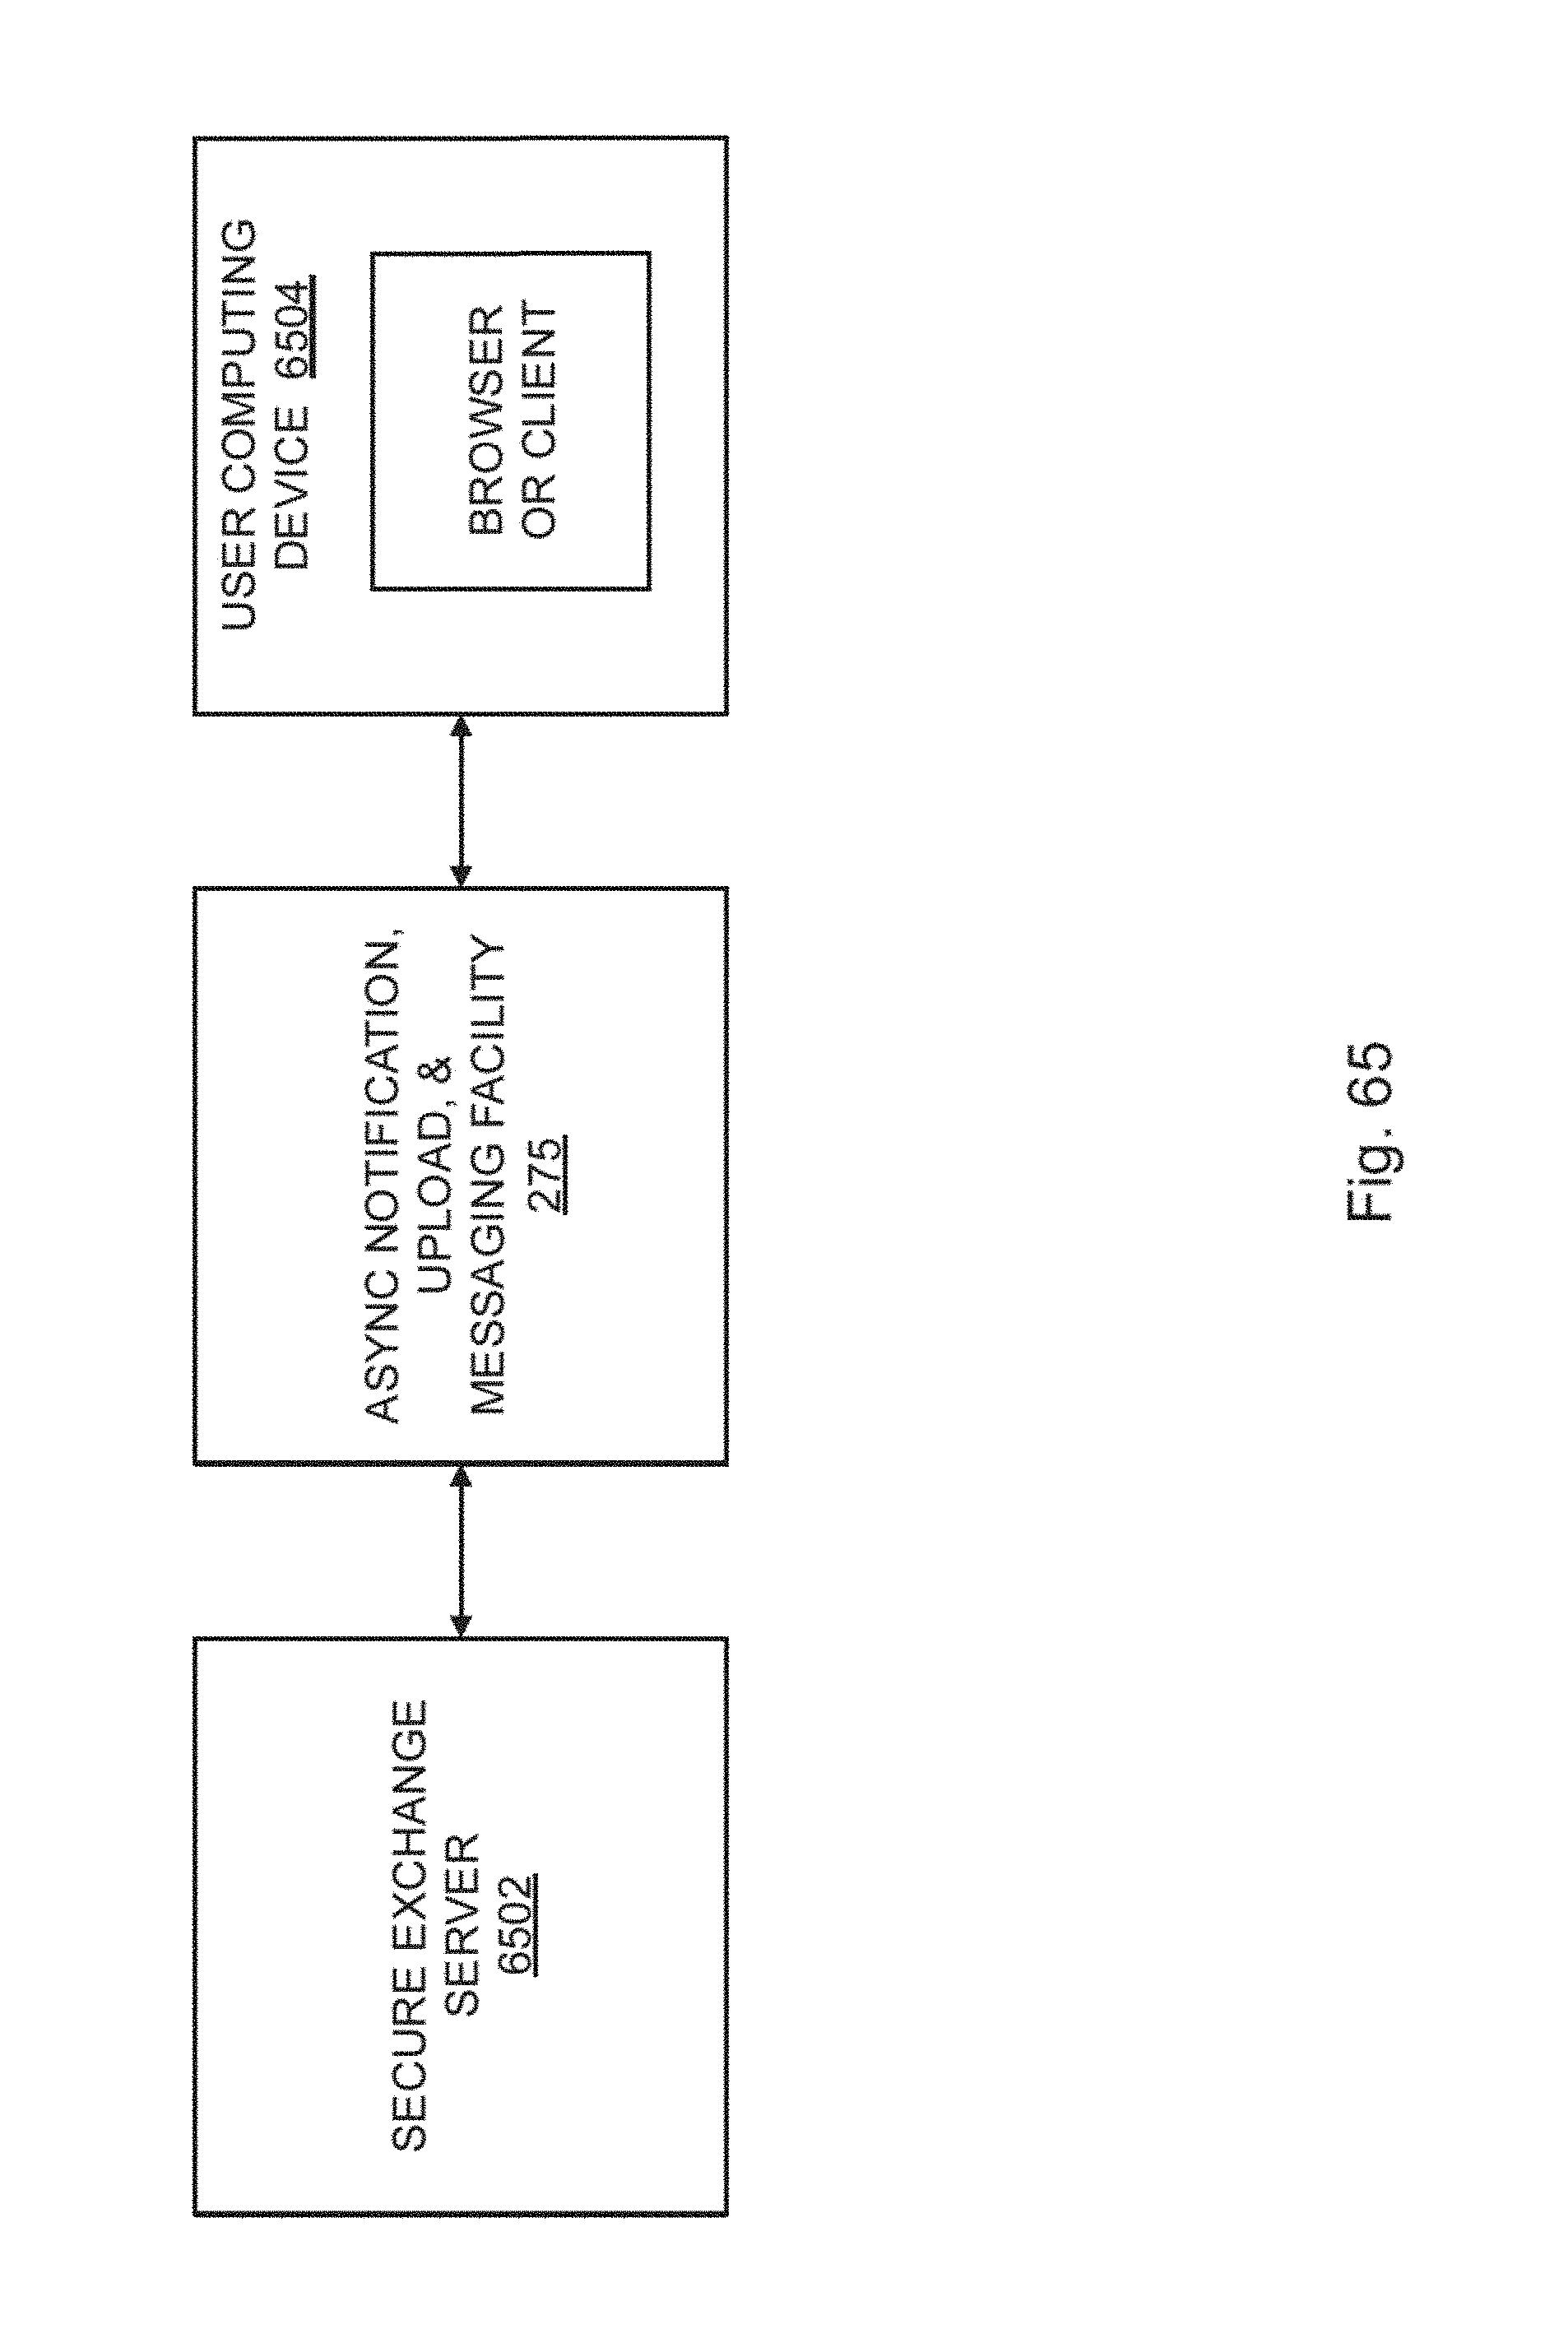 Patent US 10,033,702 B2